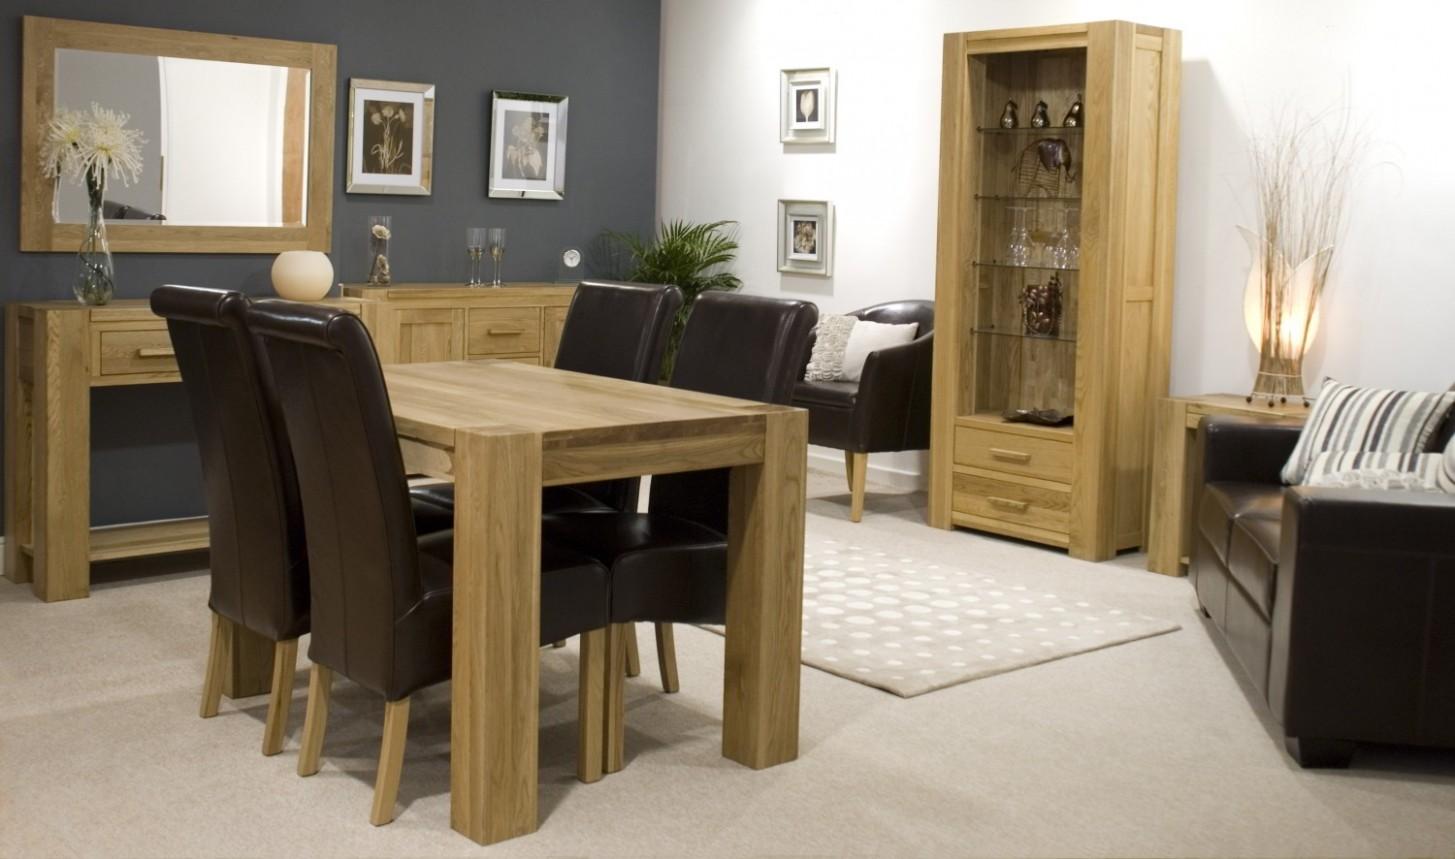 Living Room Oak Furniture Beautiful Dining Chairs Cottage Style  - Dining Room Ideas Oak Furniture